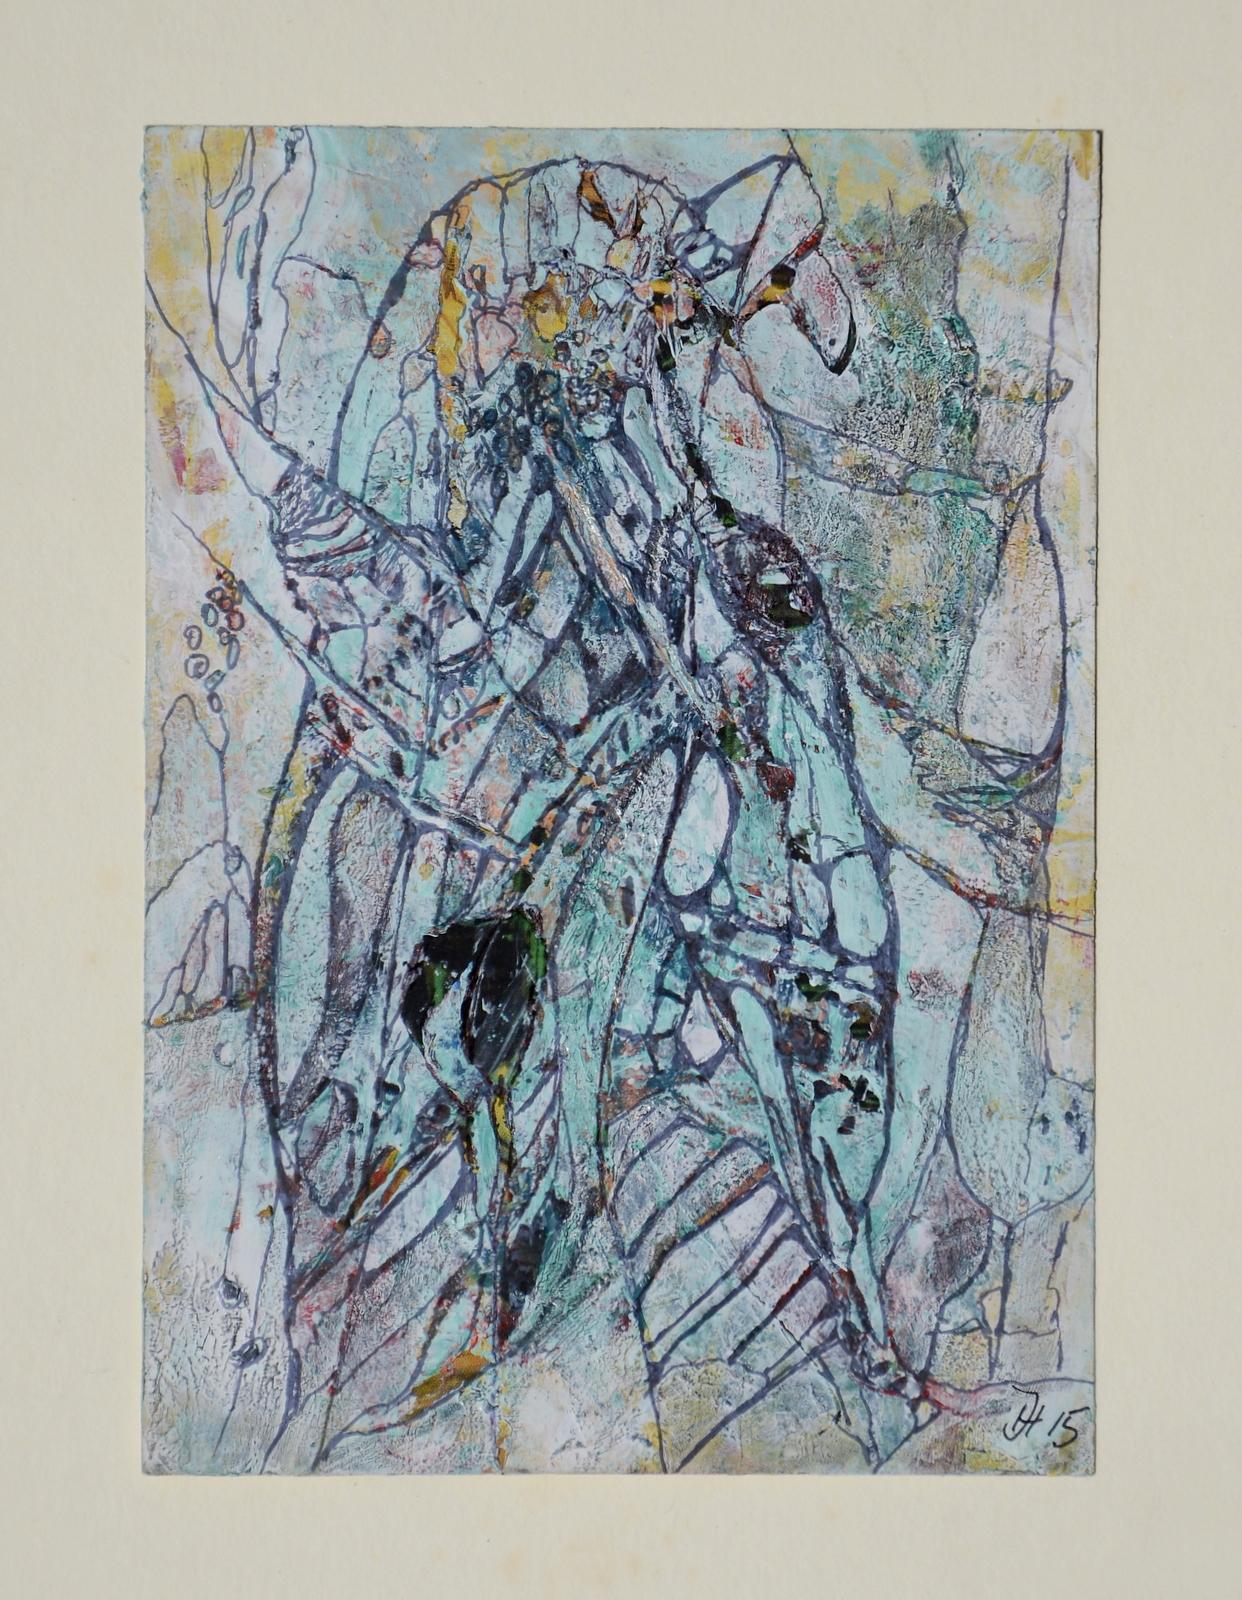 pleitegeier,10,5x15cm,acryl auf papier .2015.JPG